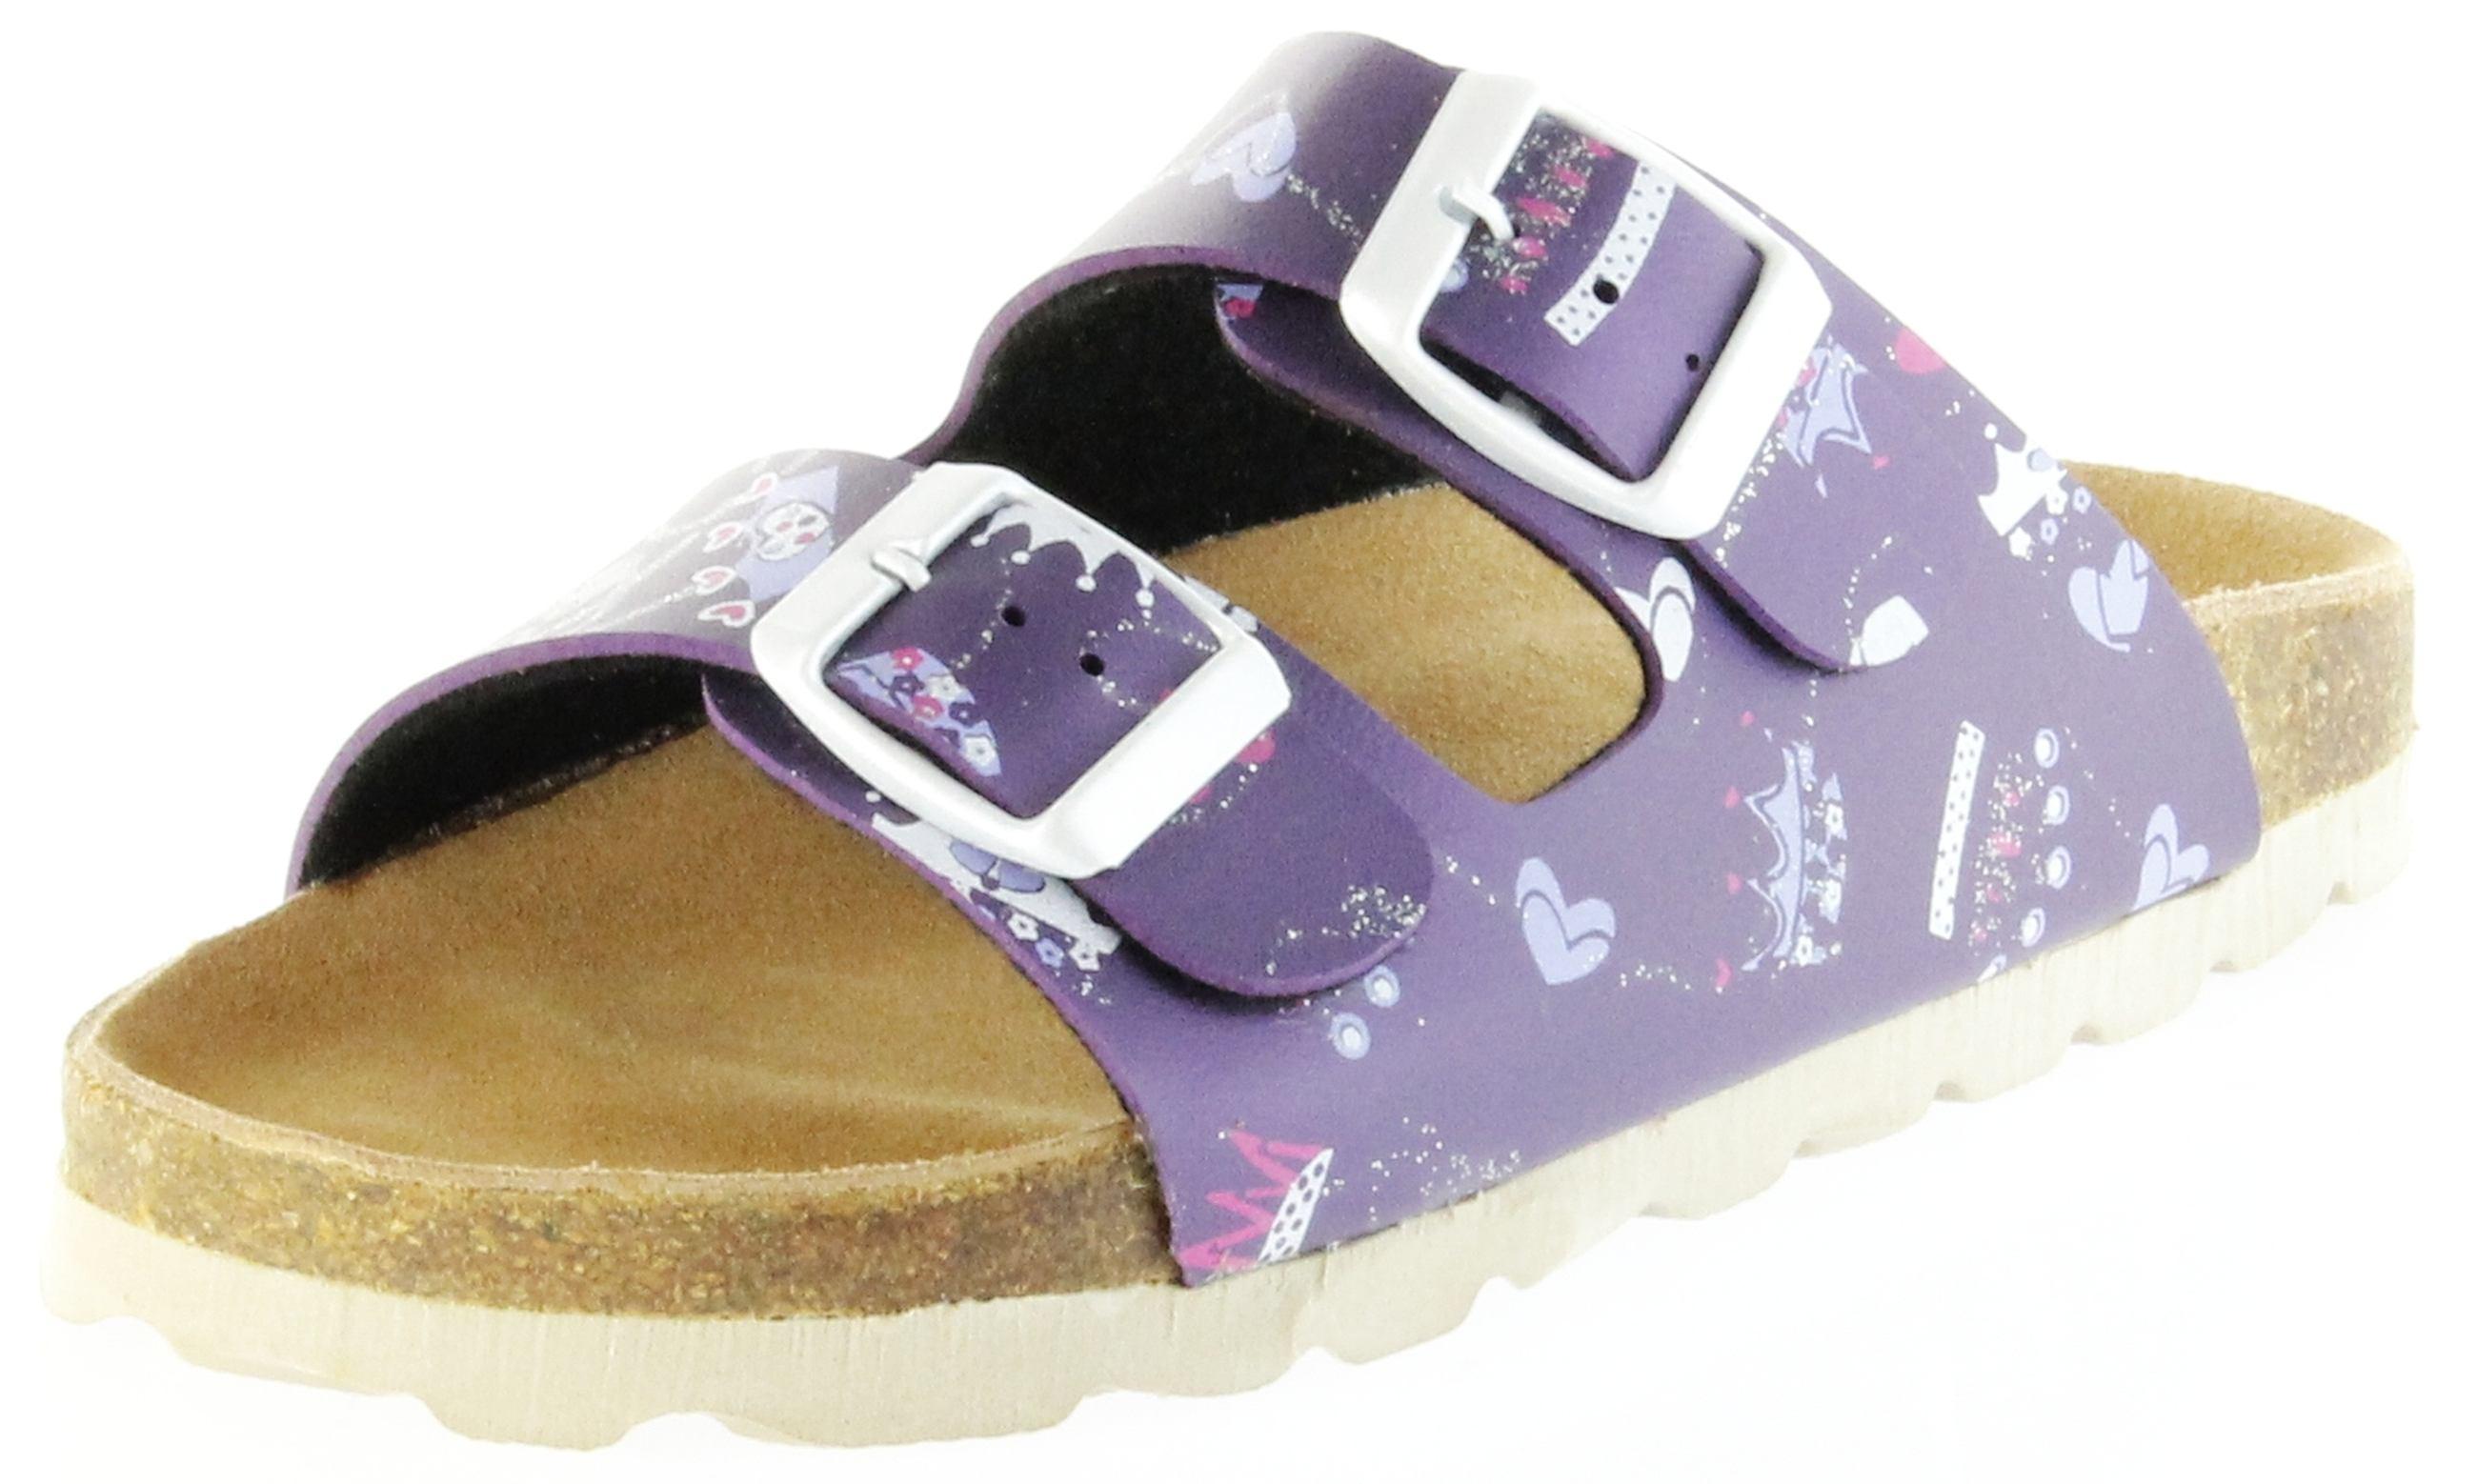 Schuhe mit lila sohle